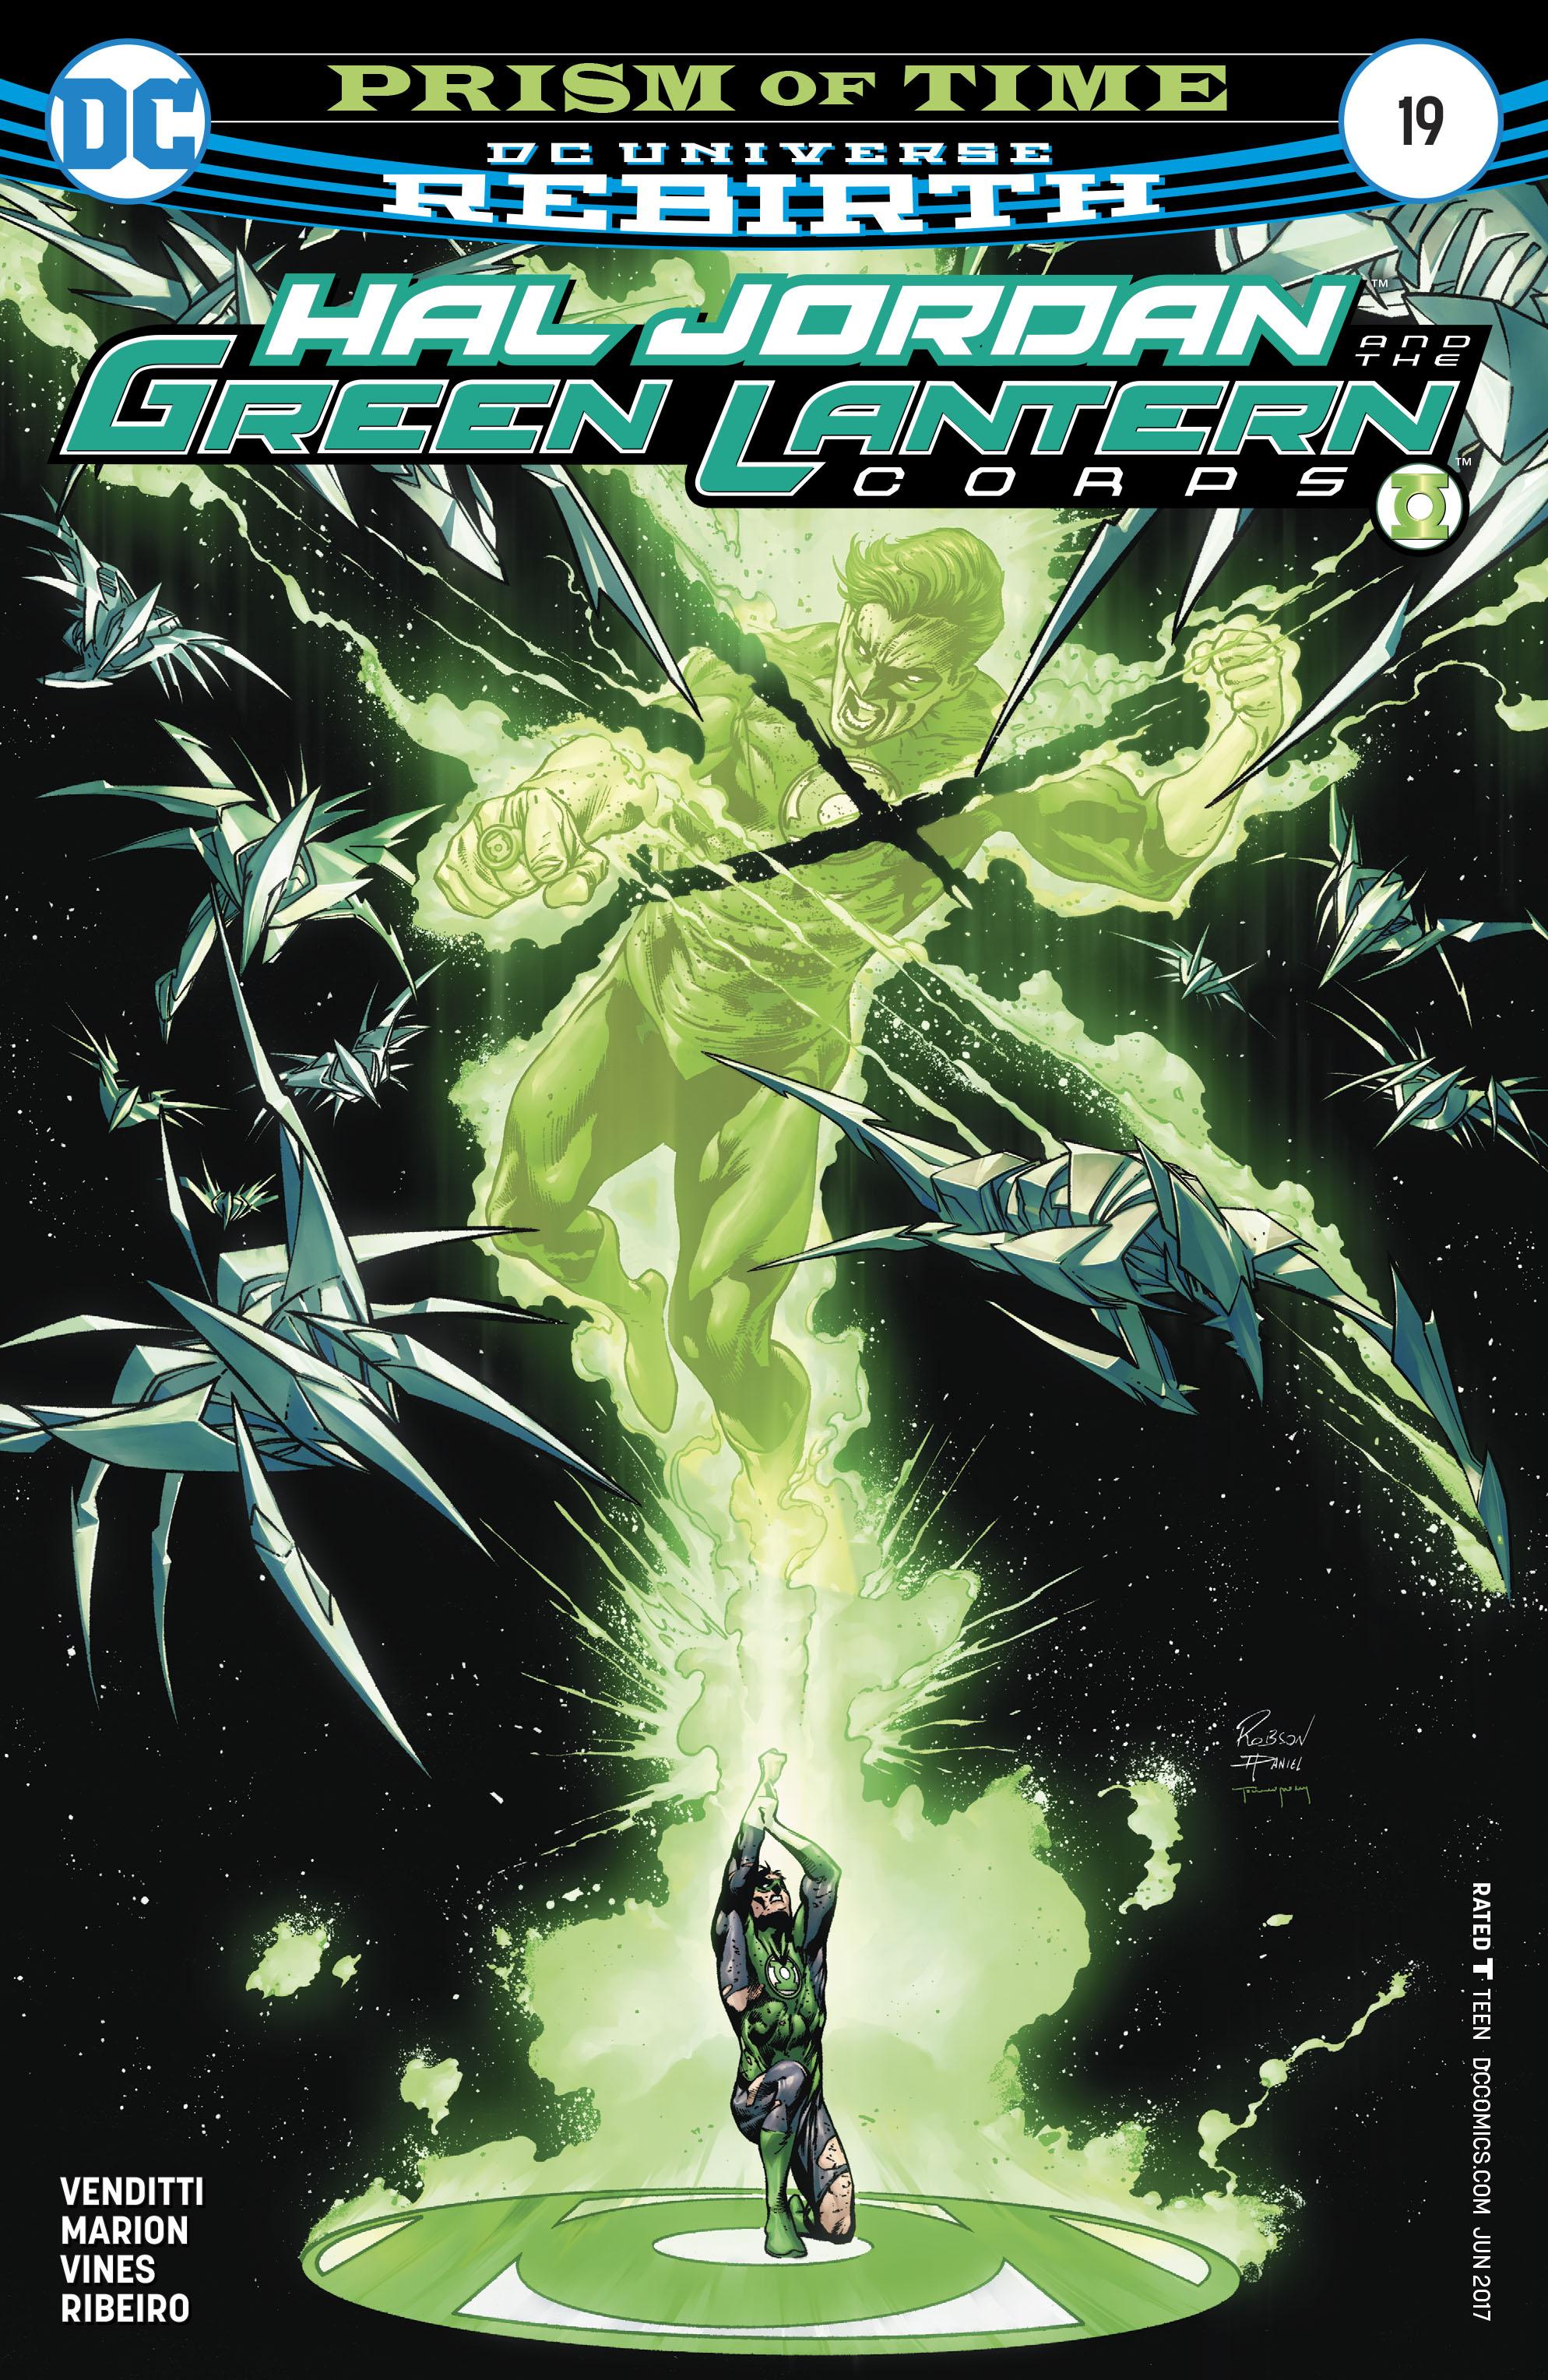 Hal Jordan & the Green Lantern Corps: Rebirth issue 19 - Page 1